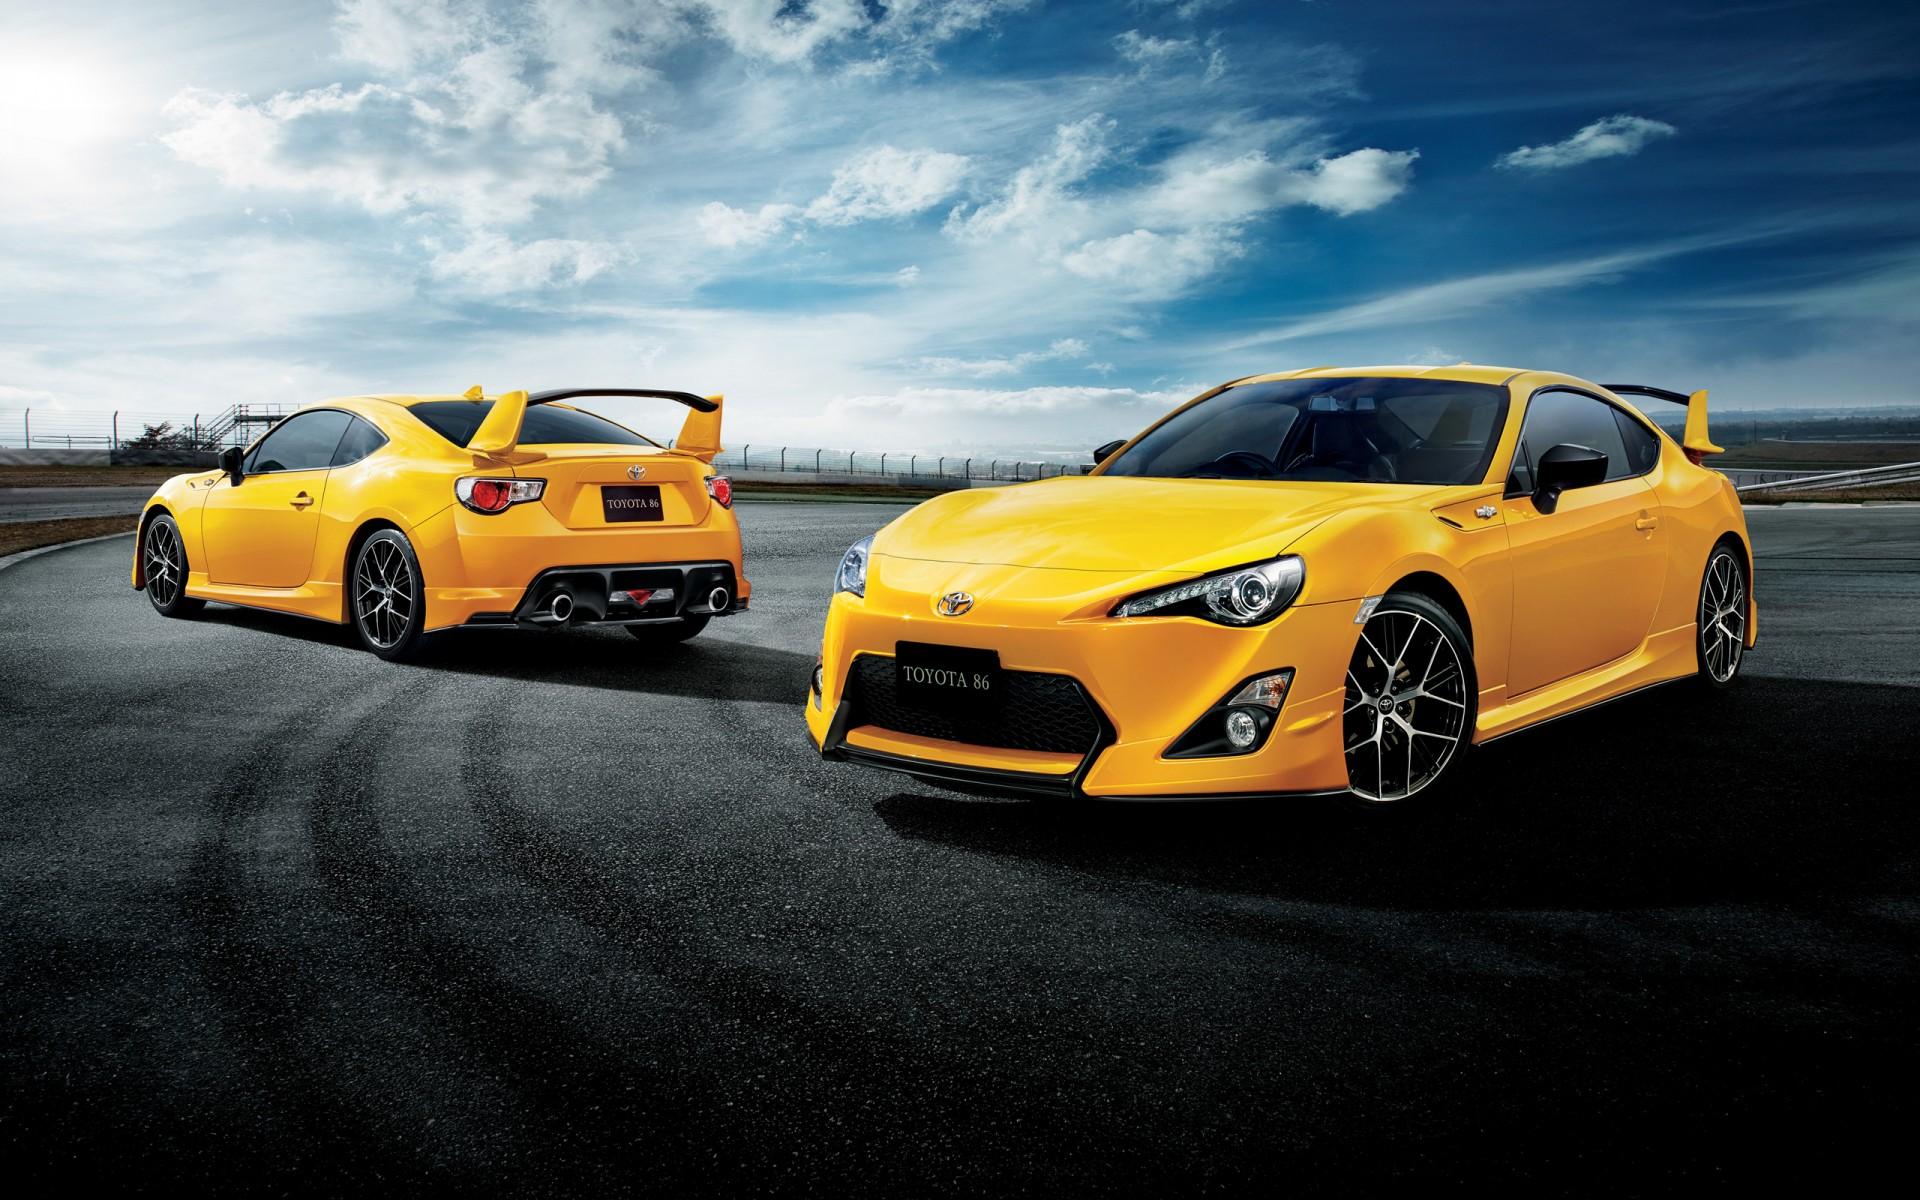 2015 Toyota 86 GT Wallpaper | HD Car Wallpapers | ID #5463